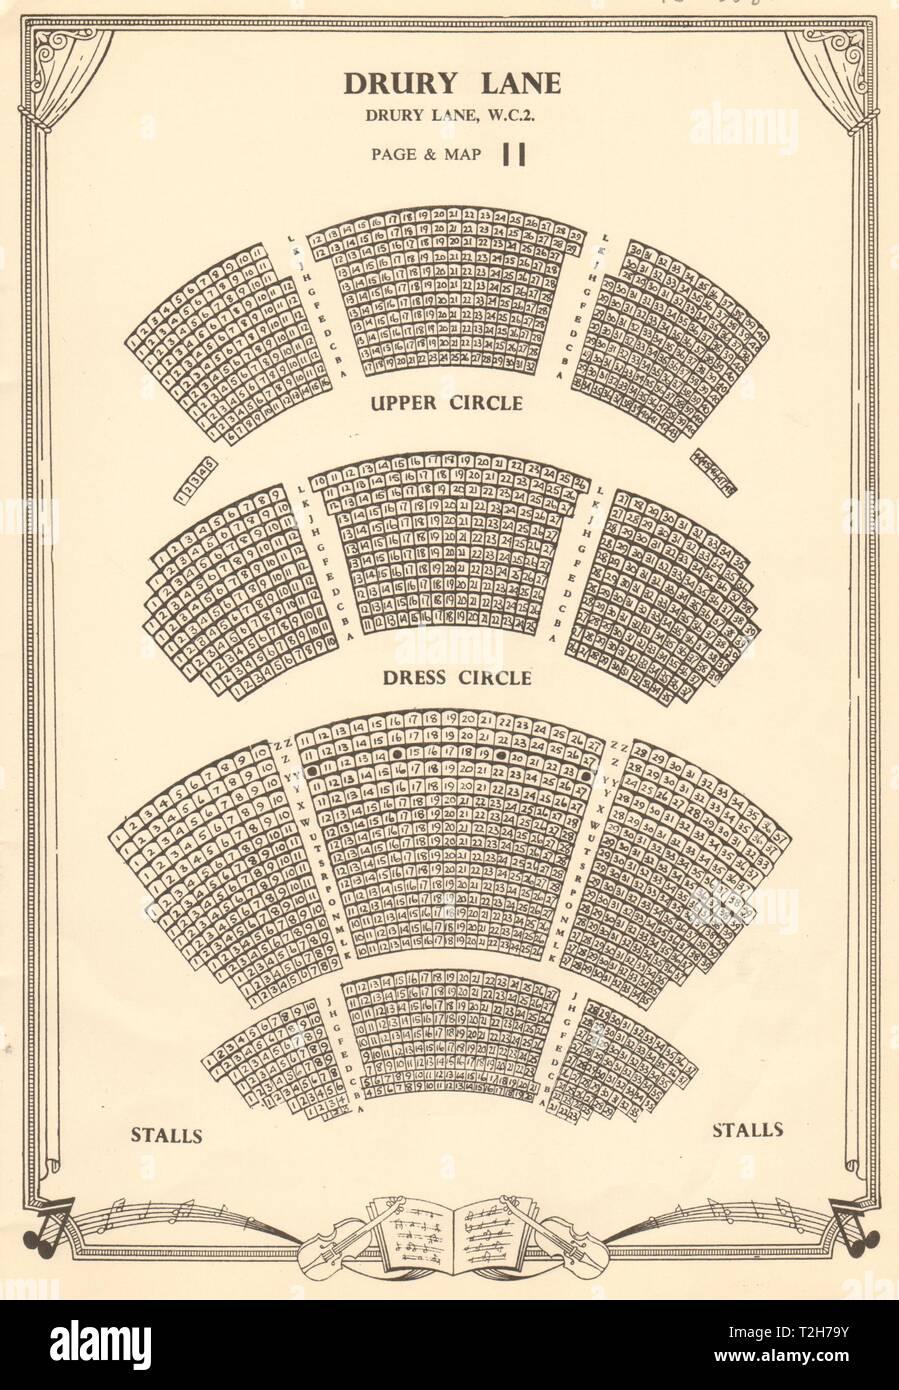 Drury Lane Theatre, Covent Garden, London. Vintage seating plan c1955 print - Stock Image